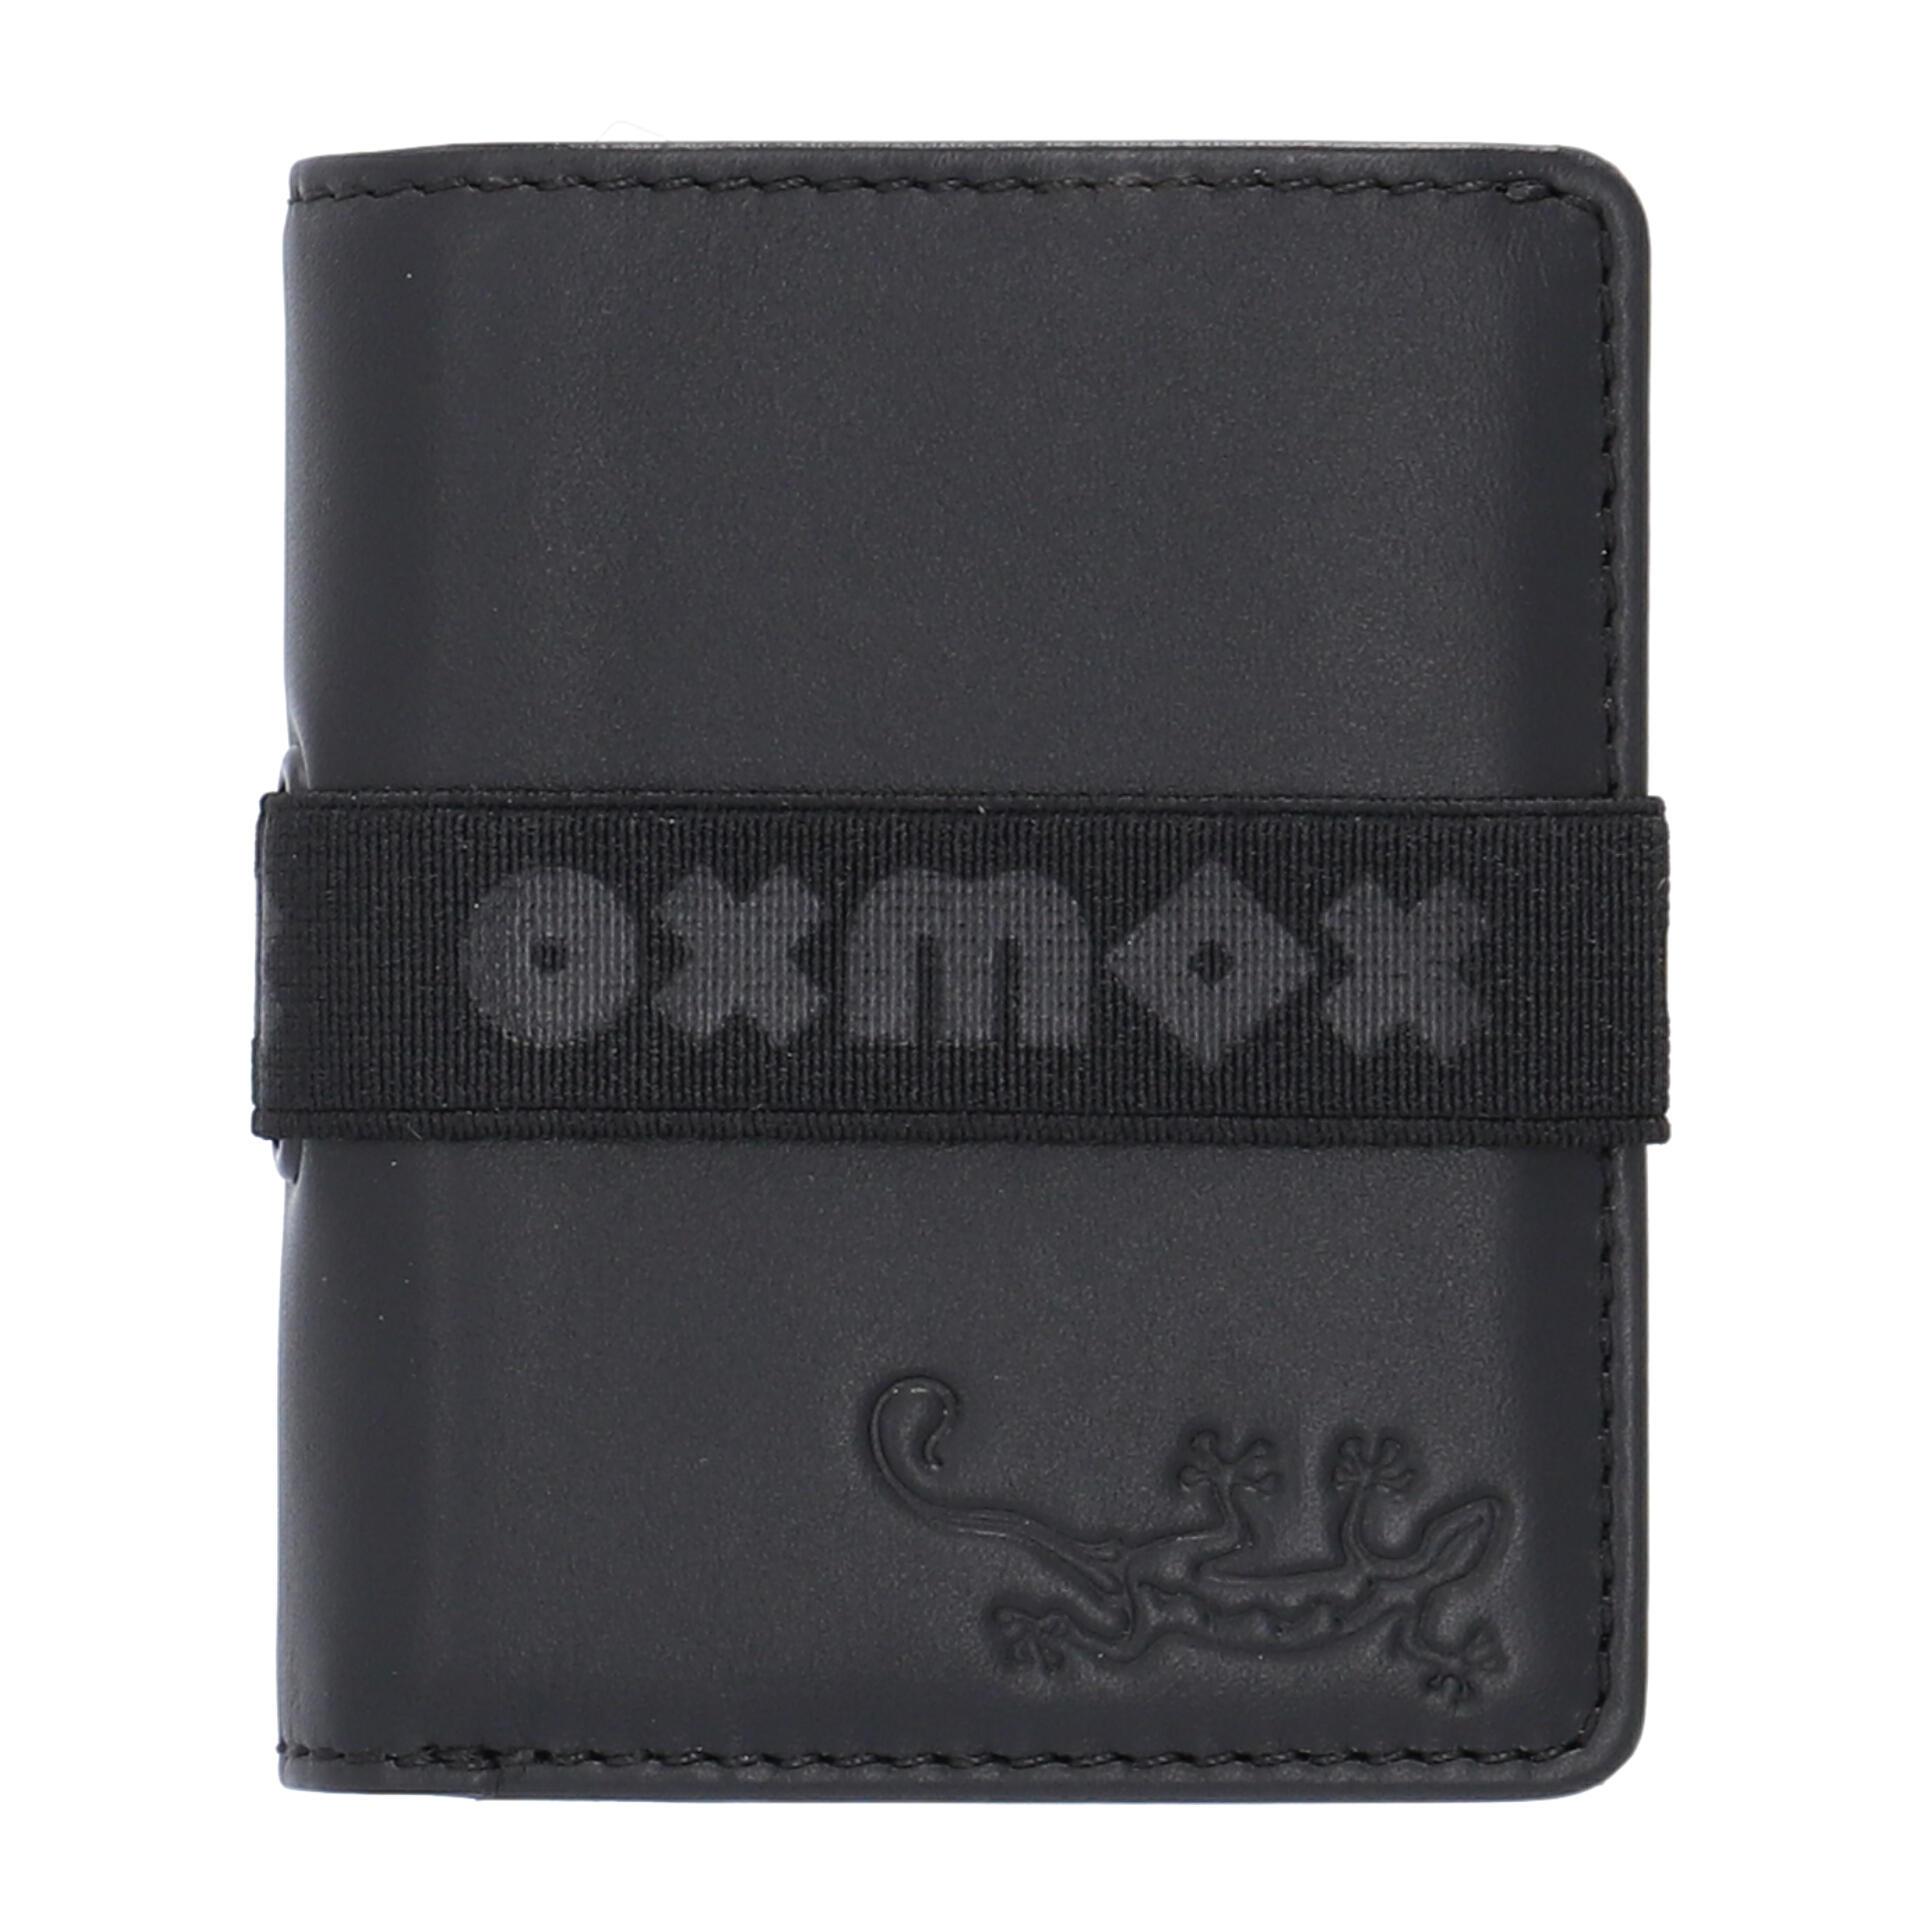 Leather oxmox Geldbörse